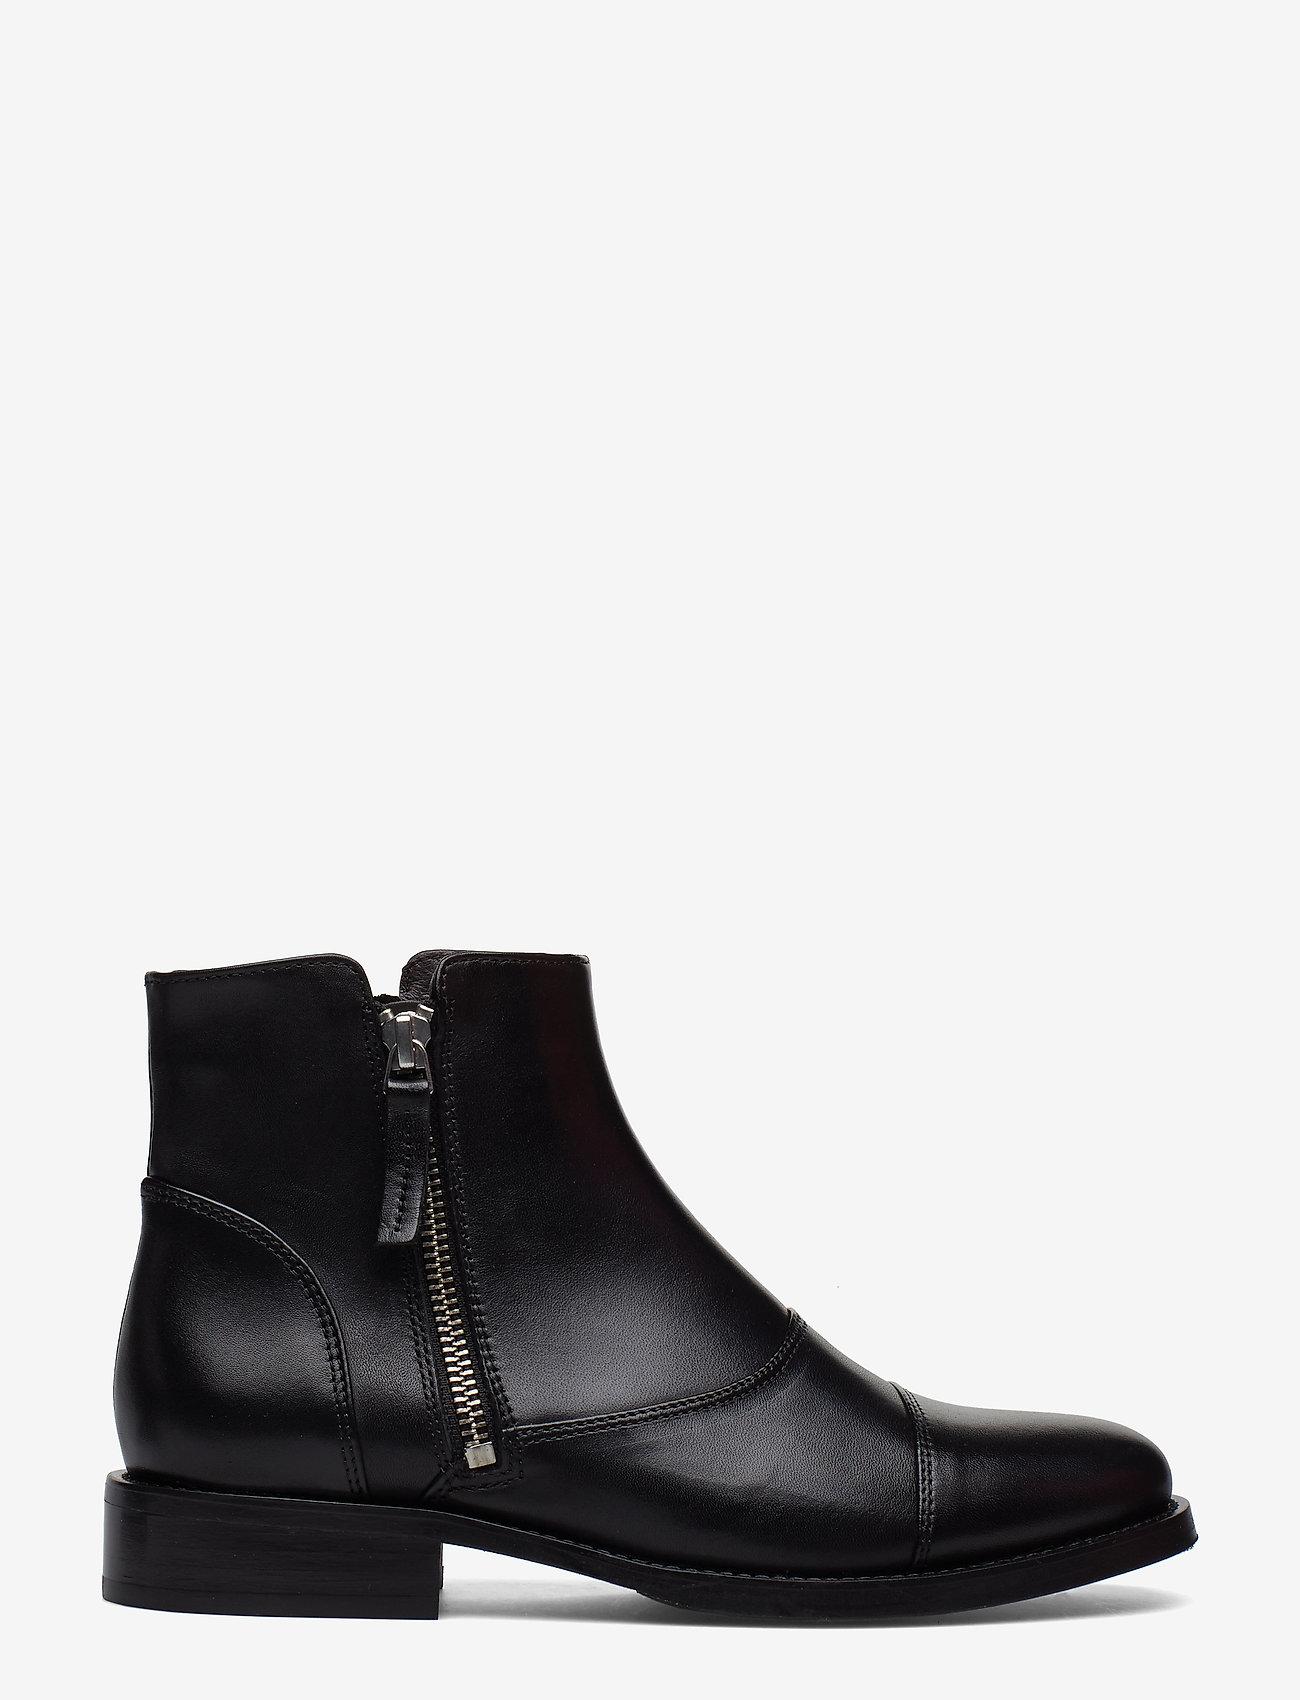 Billi Bi - BOOTS - flate ankelstøvletter - black calf/silver 603 - 1